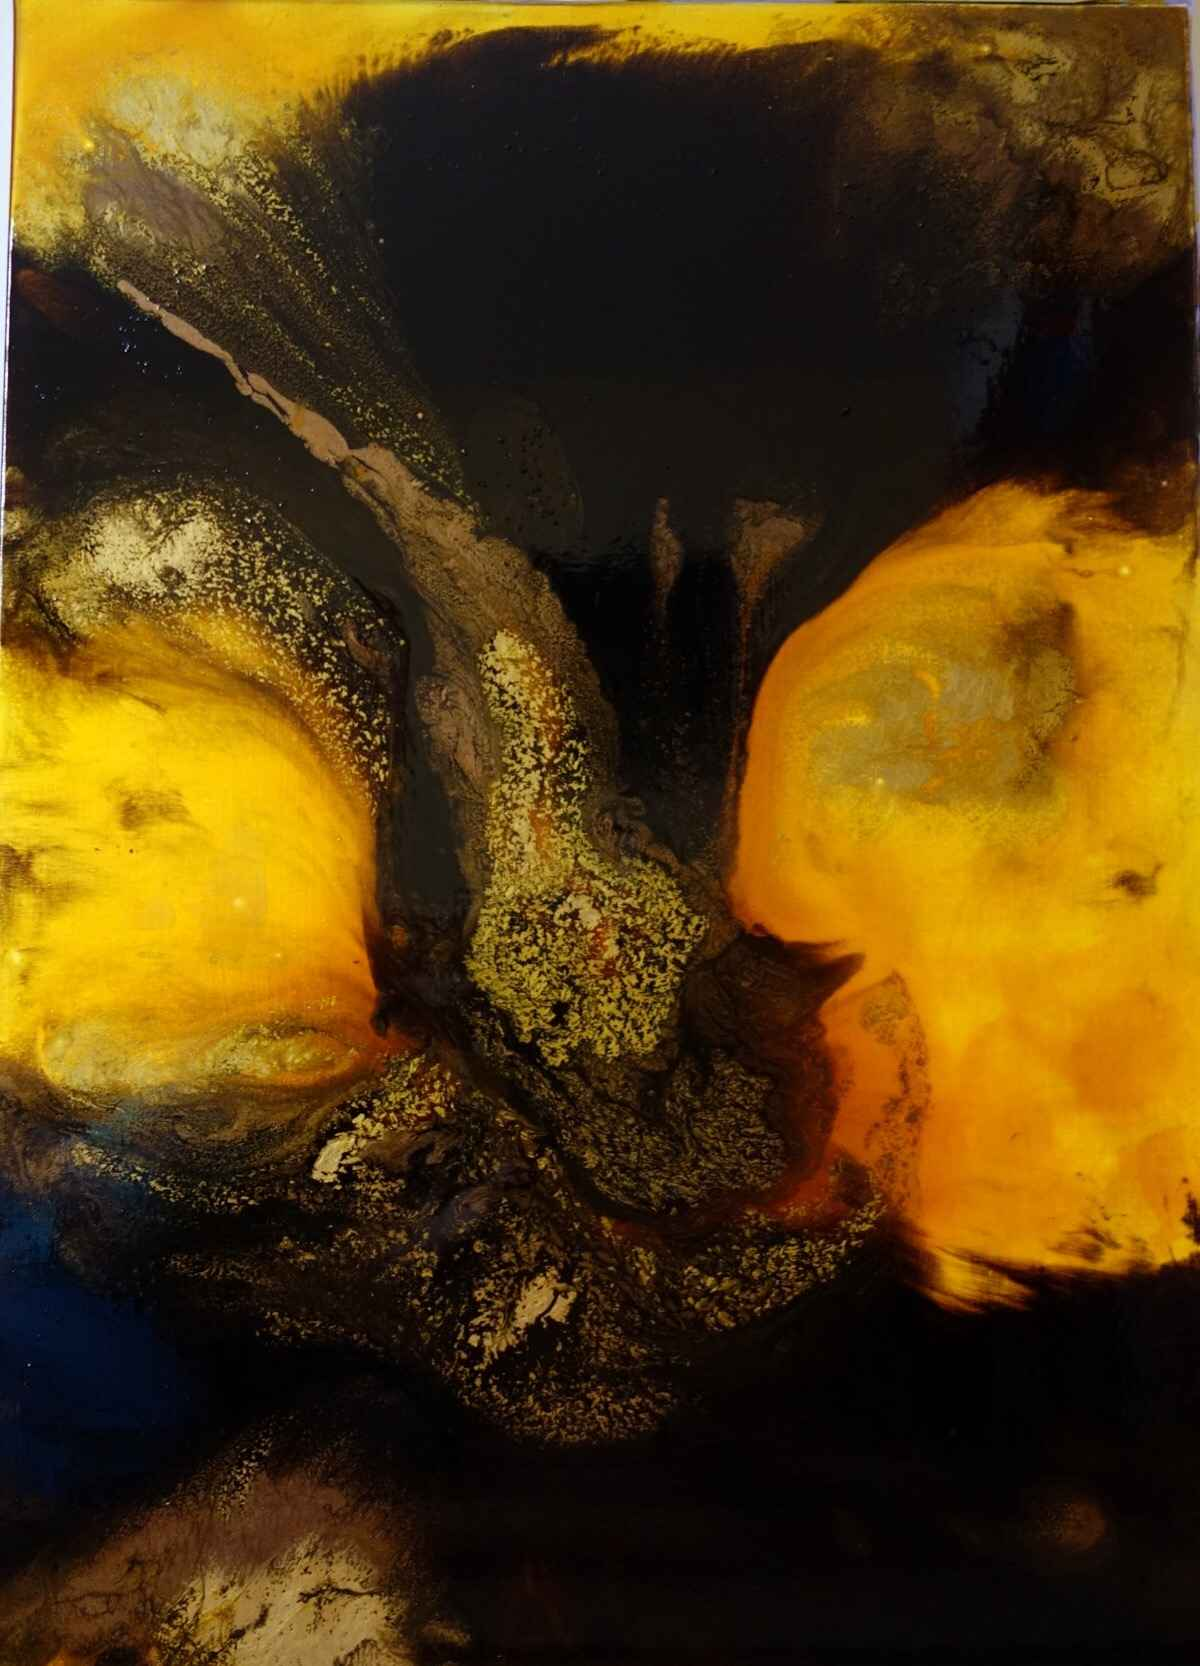 Tête-à-tête by Mme Zdenka PALKOVIC - Masterpiece Online